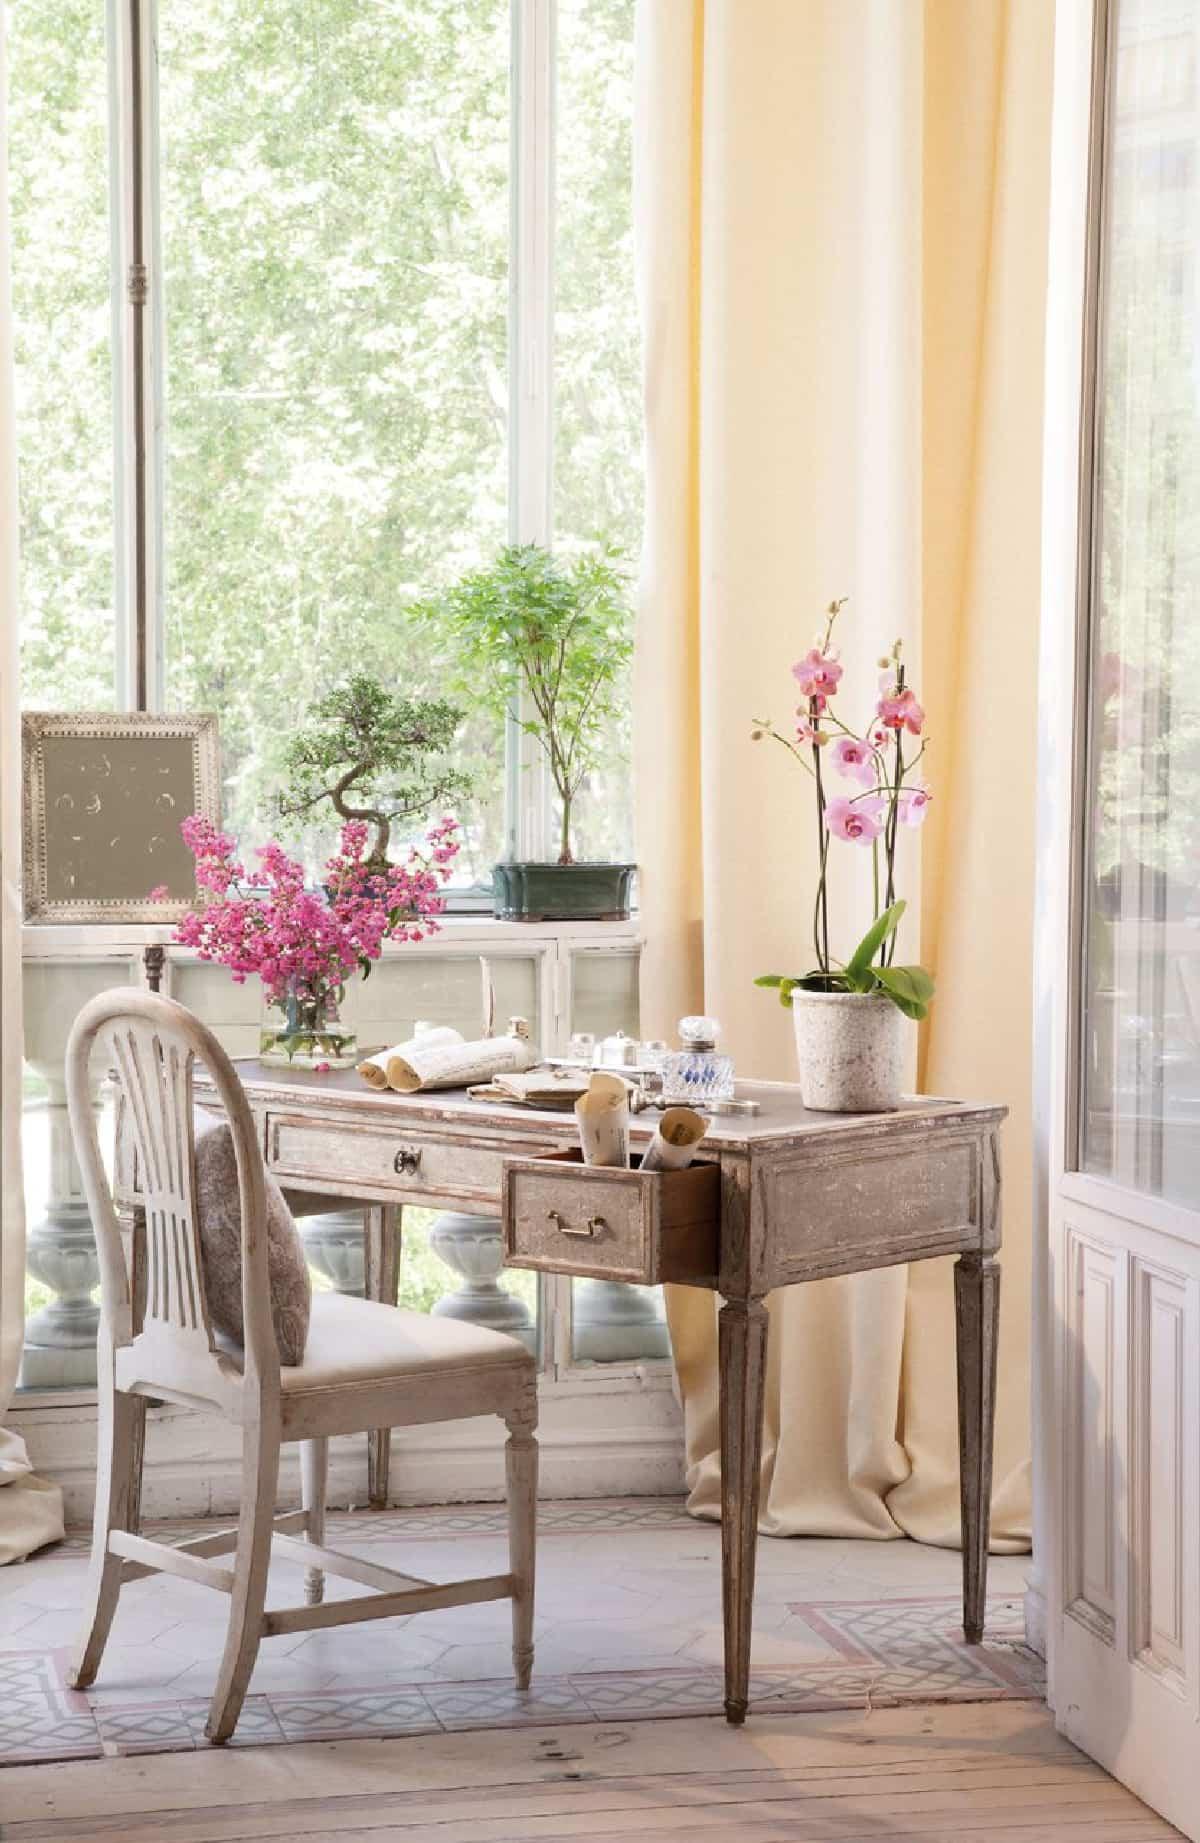 claves para decorar con orquideas tu hogar 16